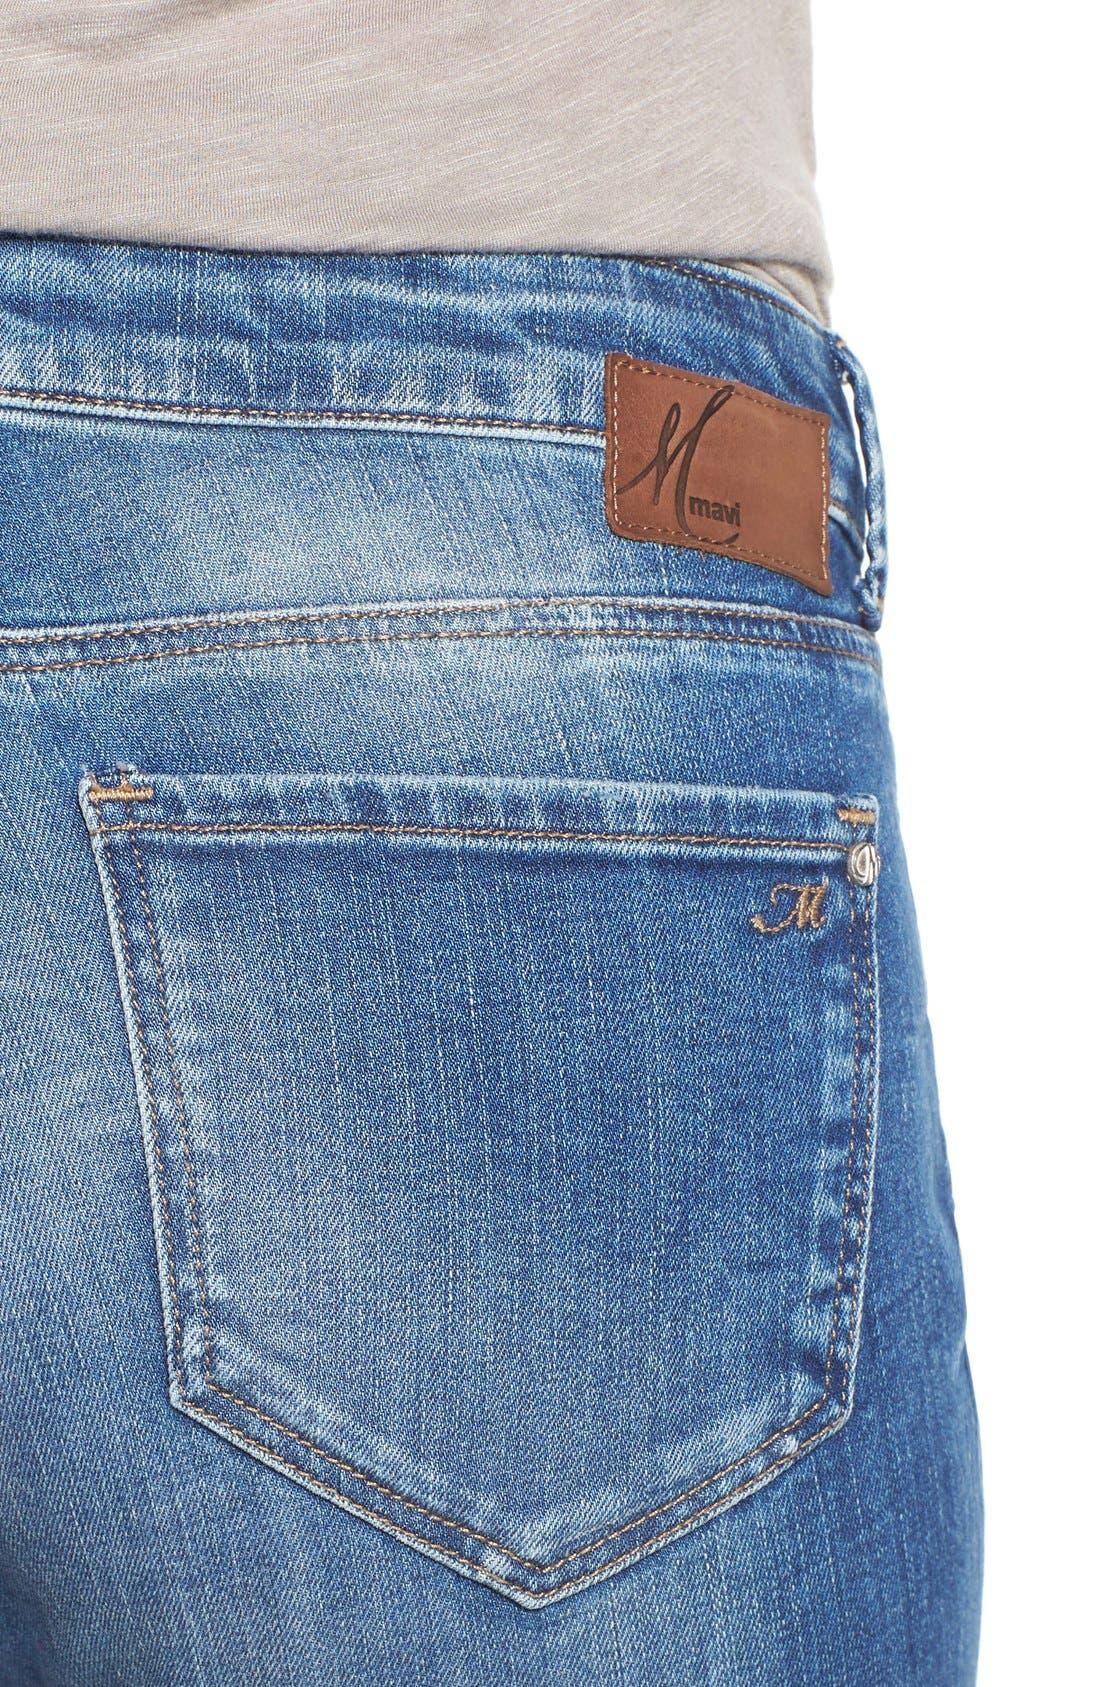 'Emma' Stretch Slim Boyfriend Jeans,                             Alternate thumbnail 5, color,                             Emma Shaded Vintage